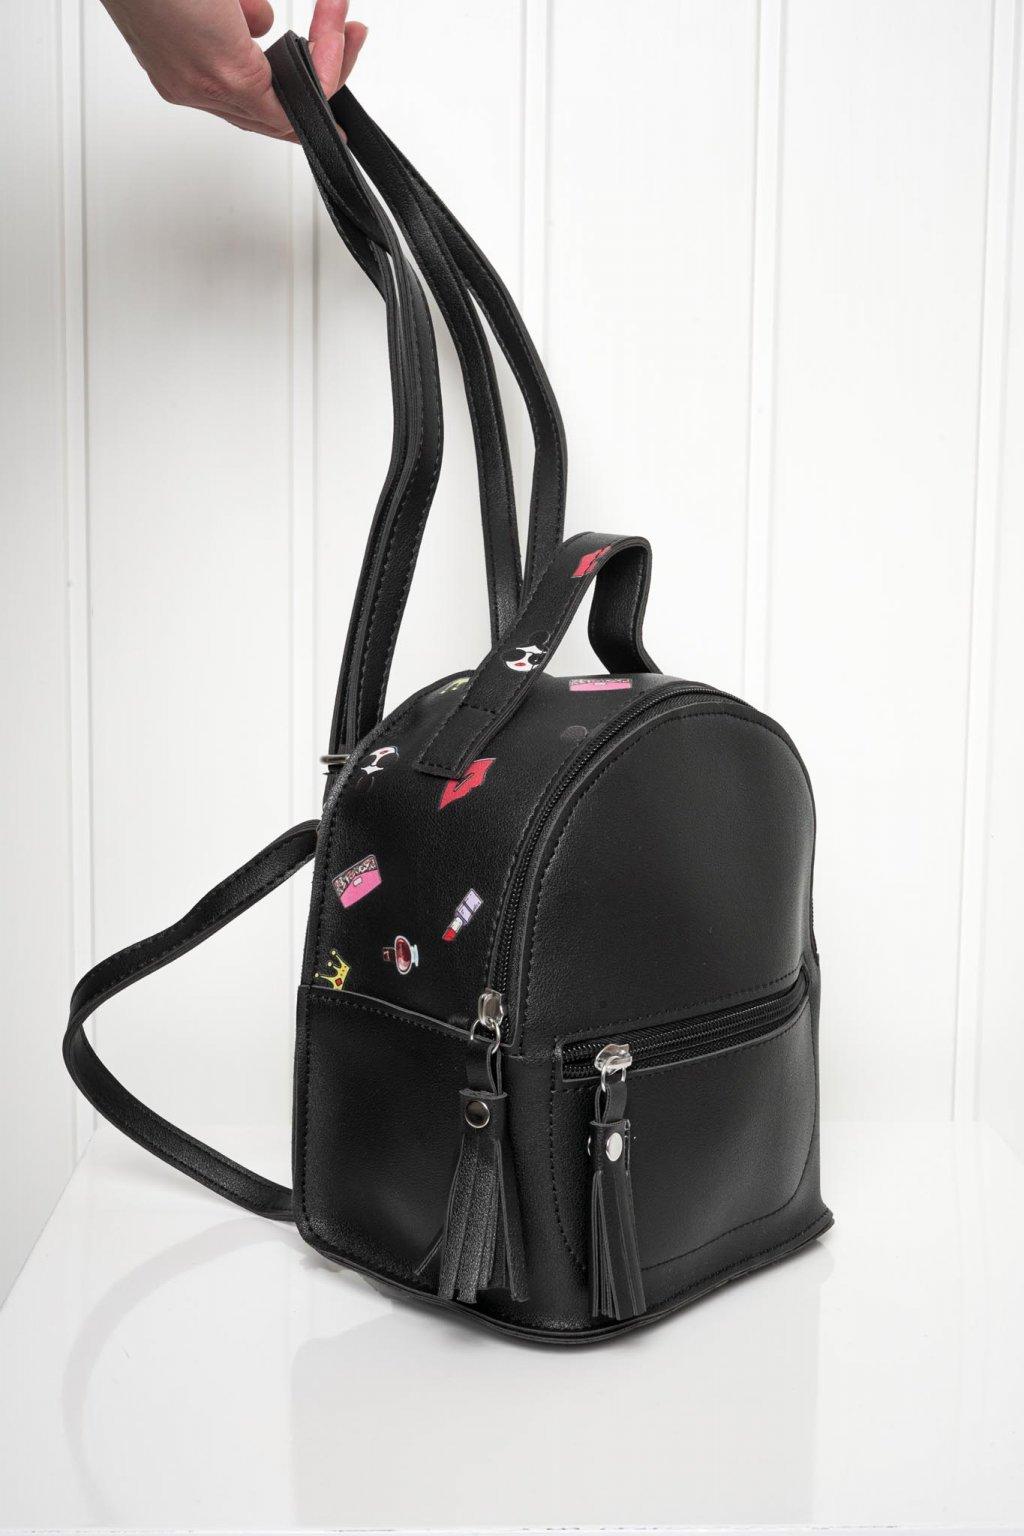 Kabelka, crossbody, ruksak, shopping bag, shopperka, 140